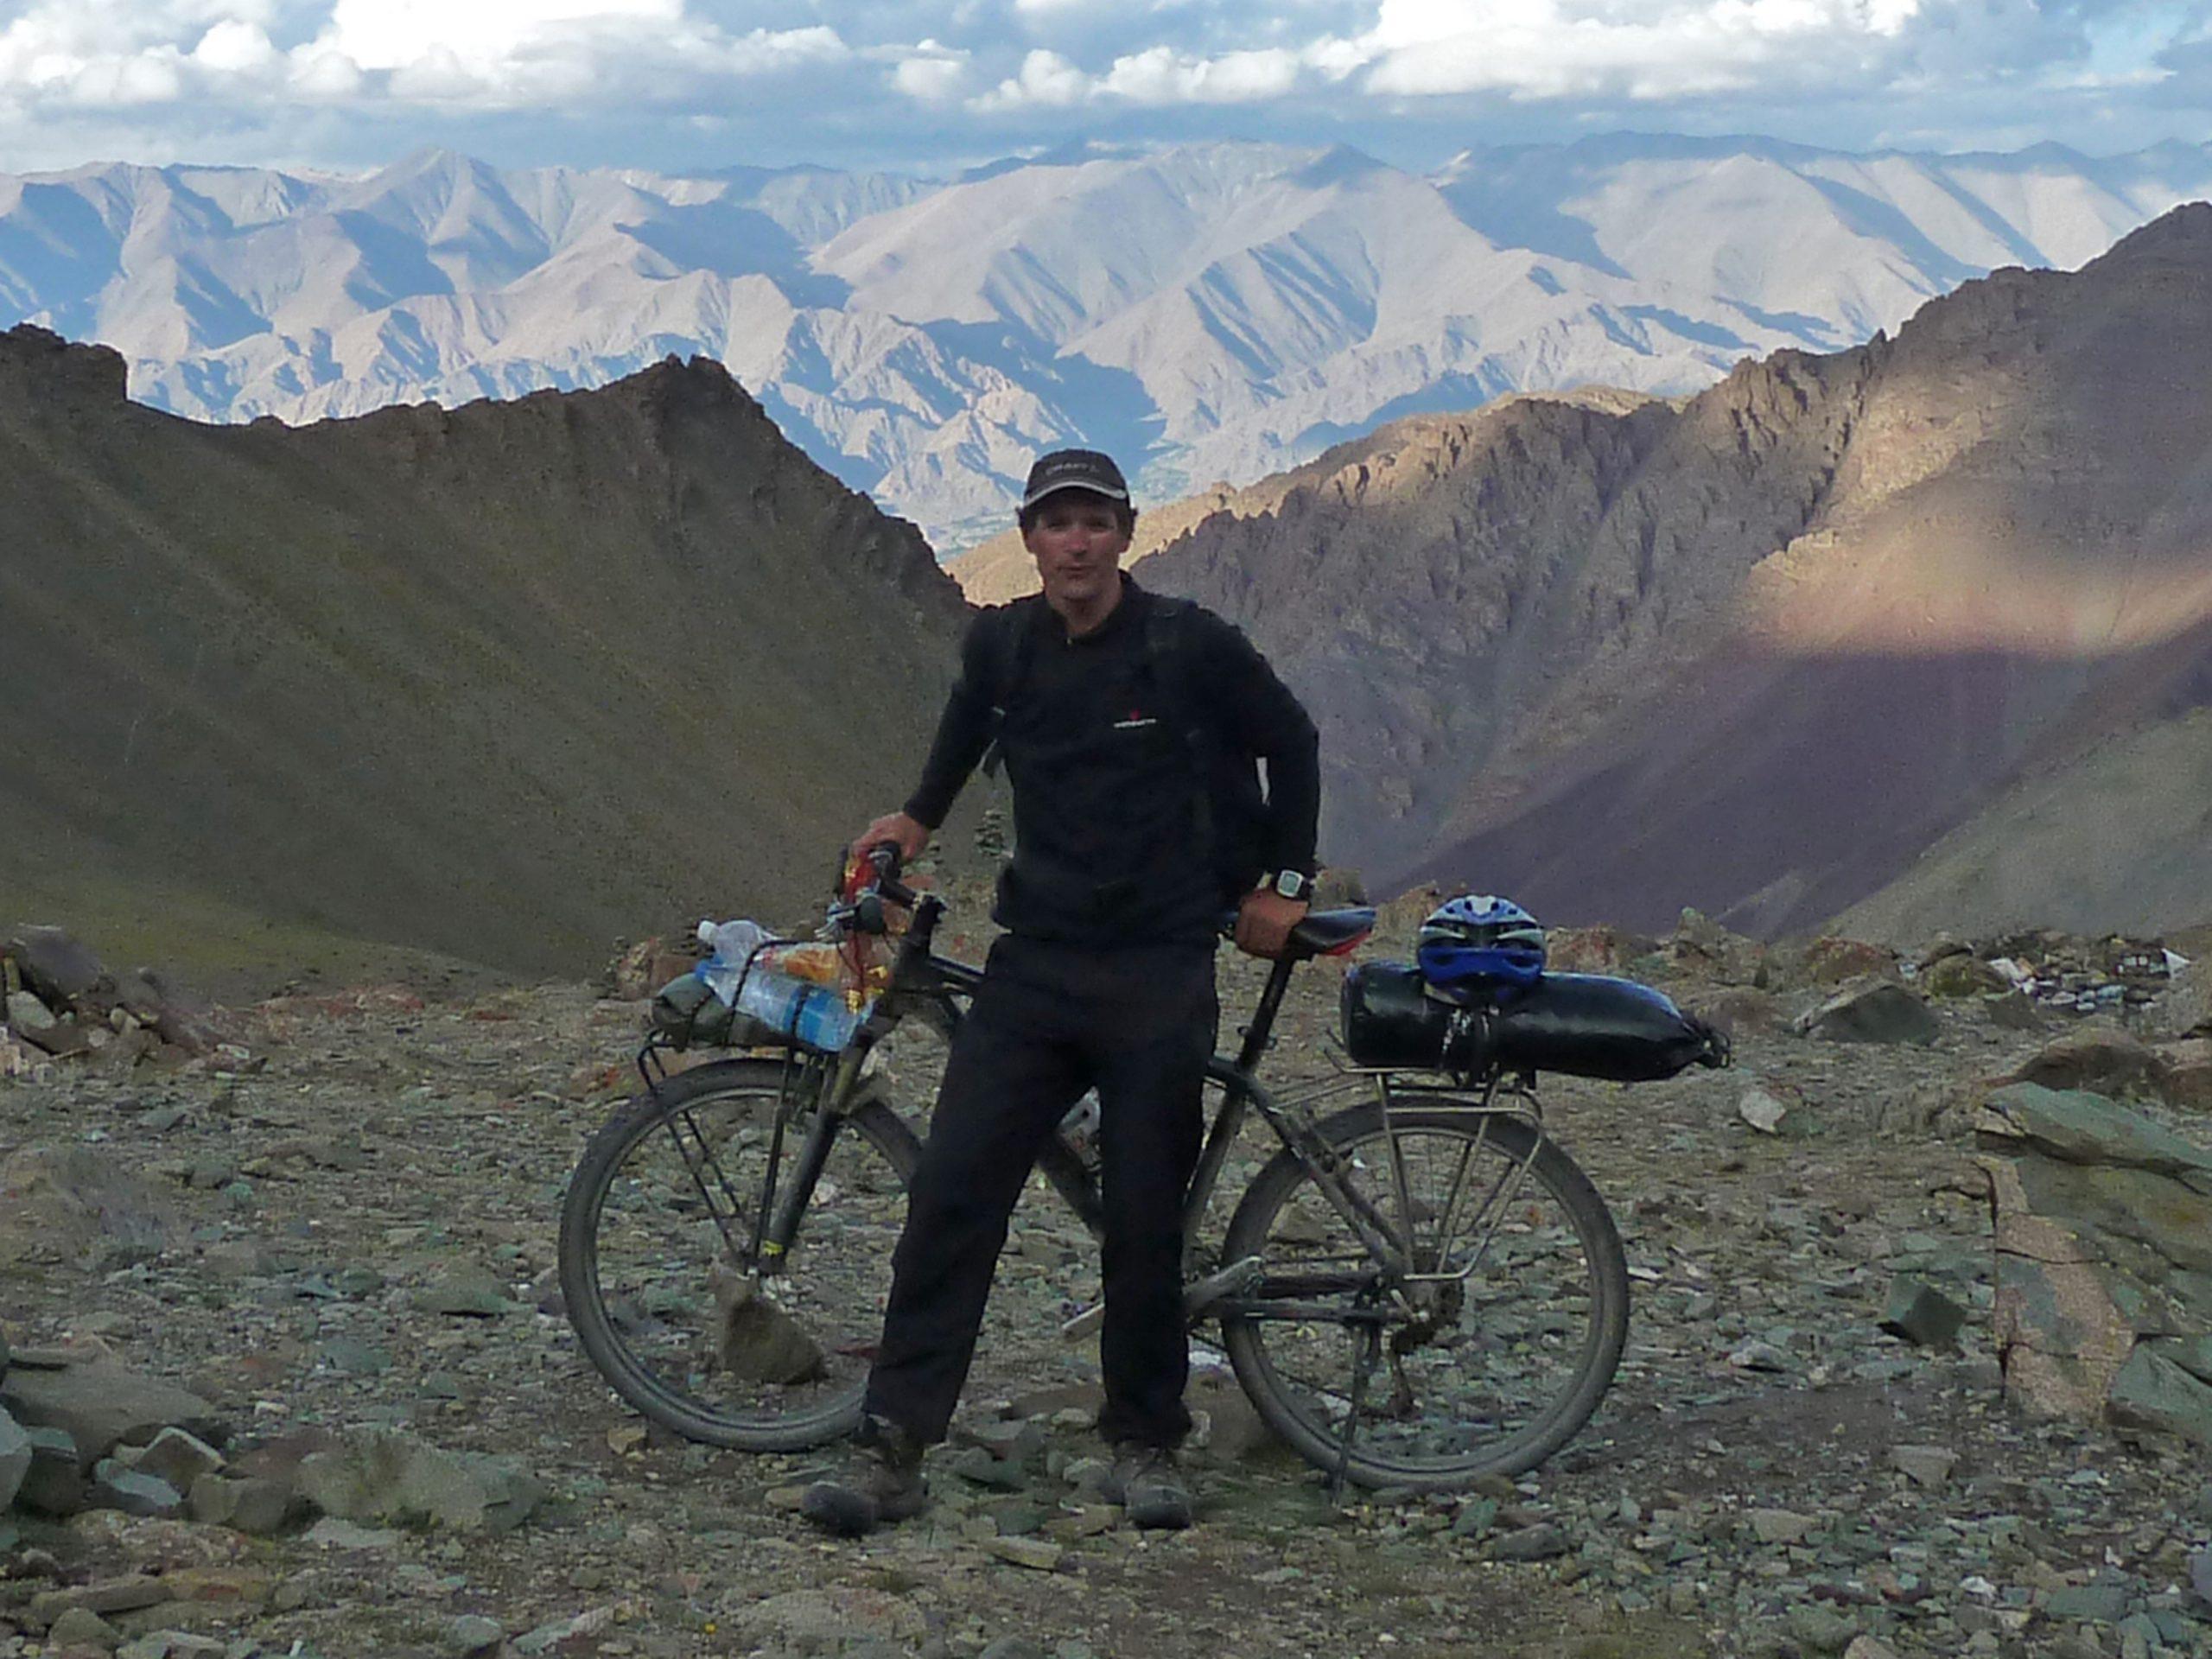 Radreise Ladakh 2012 - Basecamp Stok Kangri (4.980m)